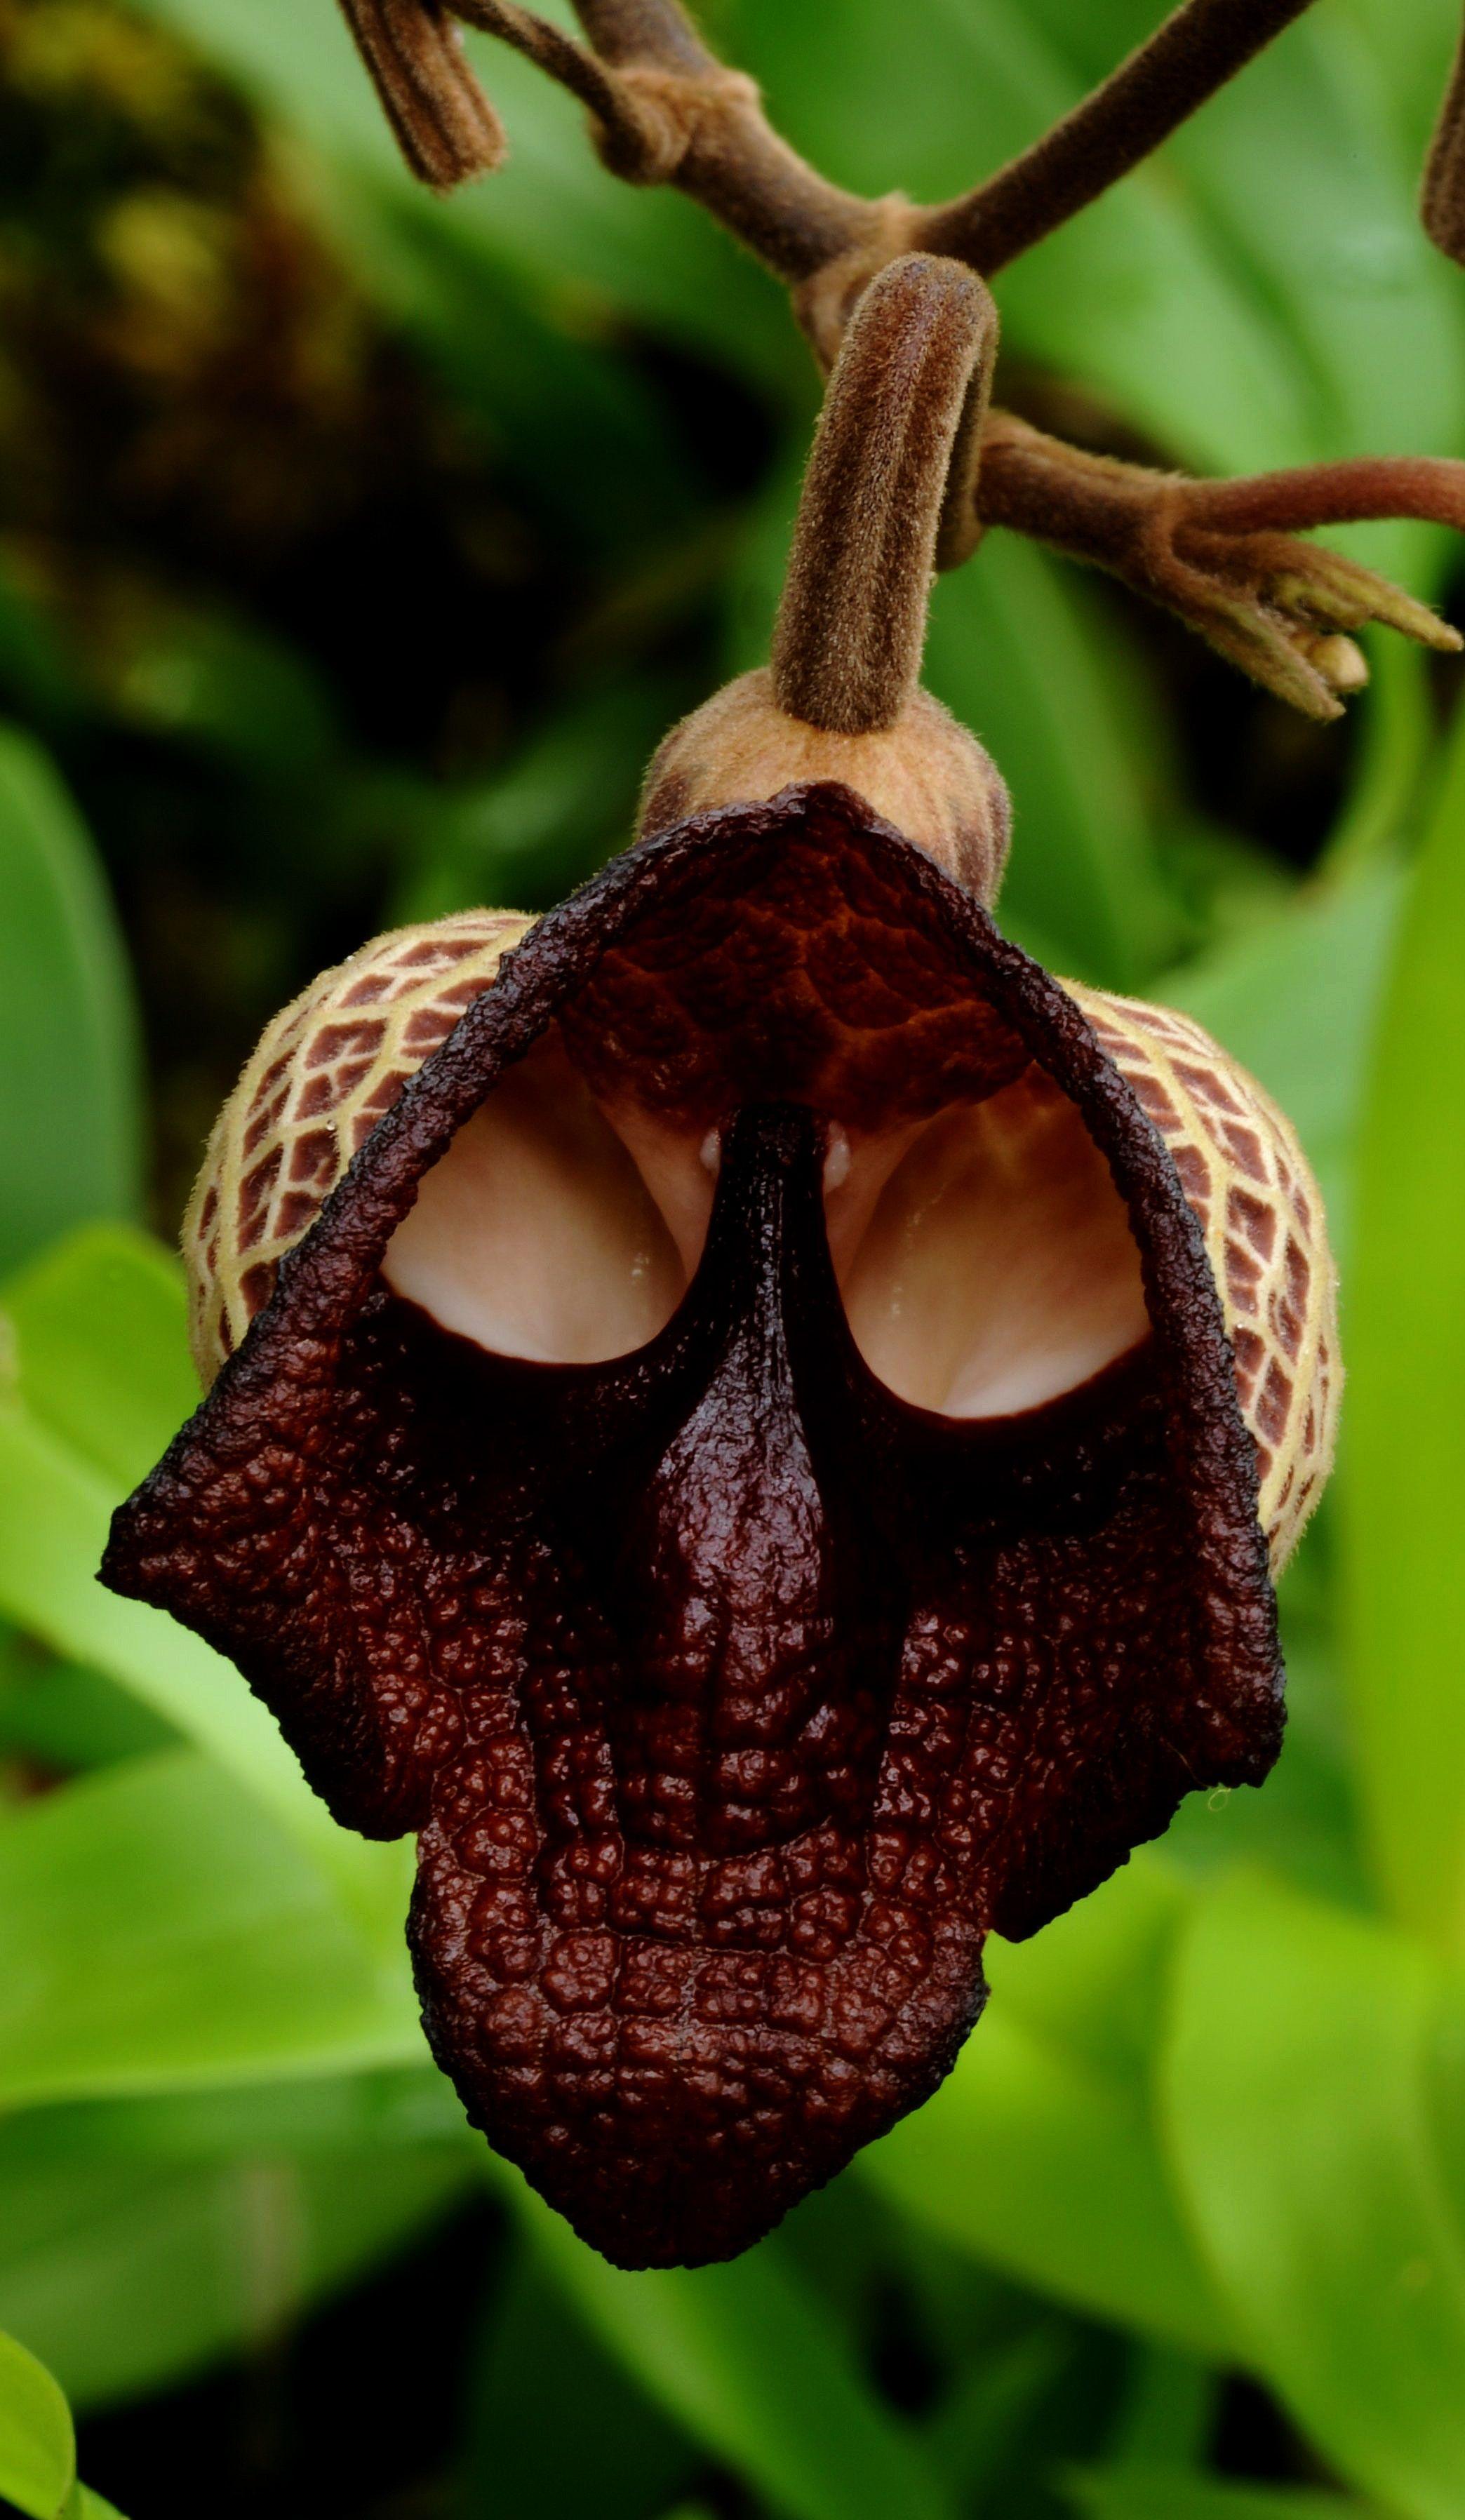 The flower Aristolochia salvador platensis seems a bit like Darth Vader from Star Wars!